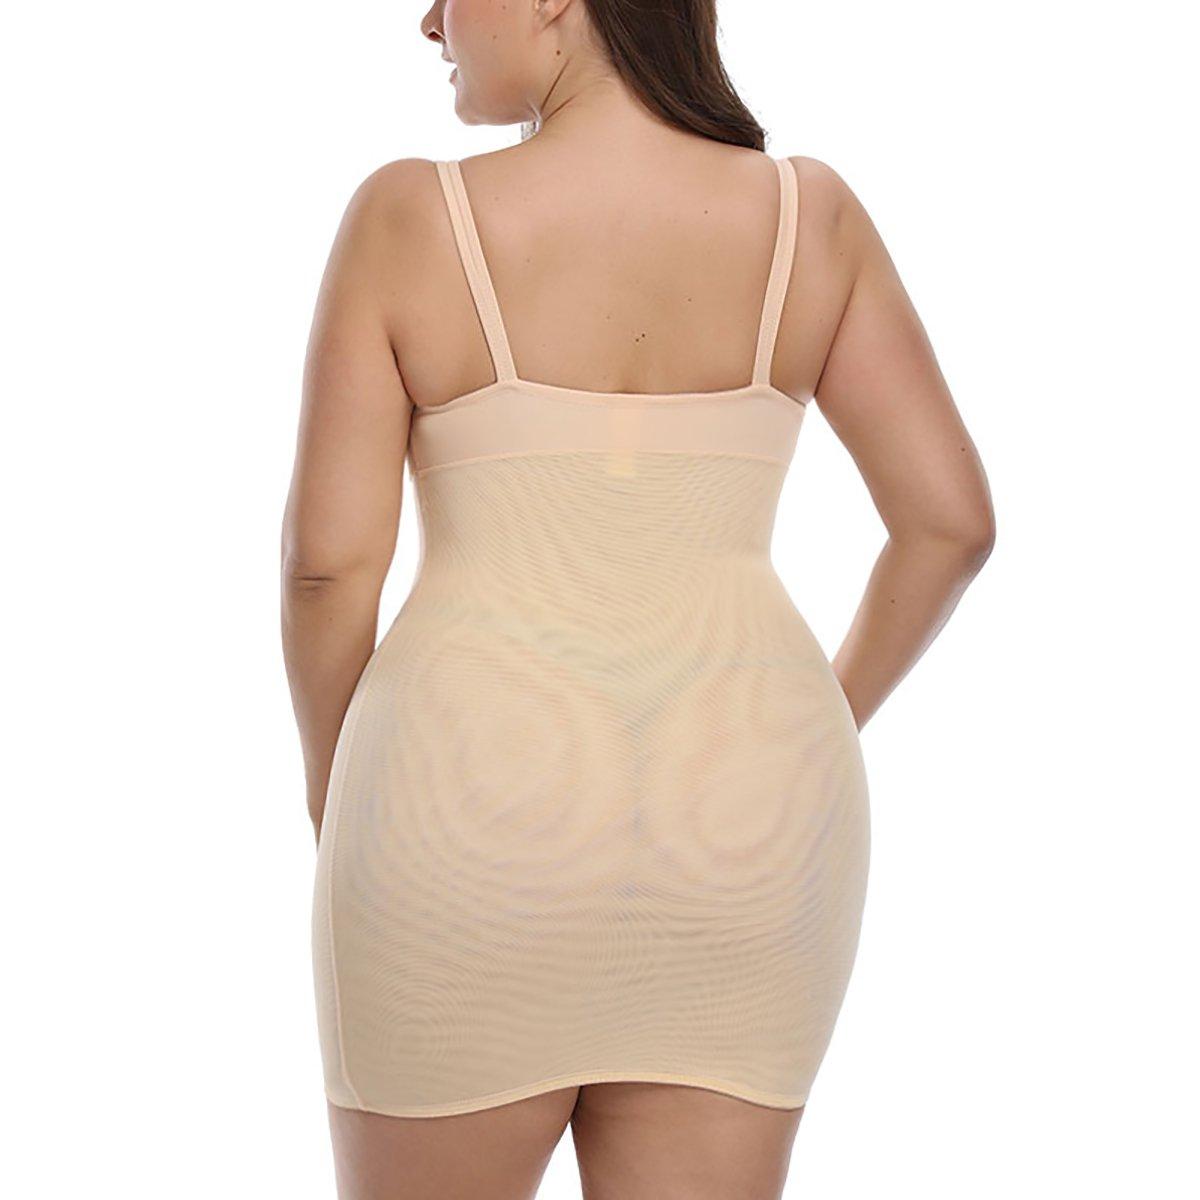 418a52abc5b TOPMELON Women's Firm Control Plus Size Slip Shapewear Seamless Spandex  Body Shaper Slimmer Feeling Yourself Full Slips at Amazon Women's Clothing  store: